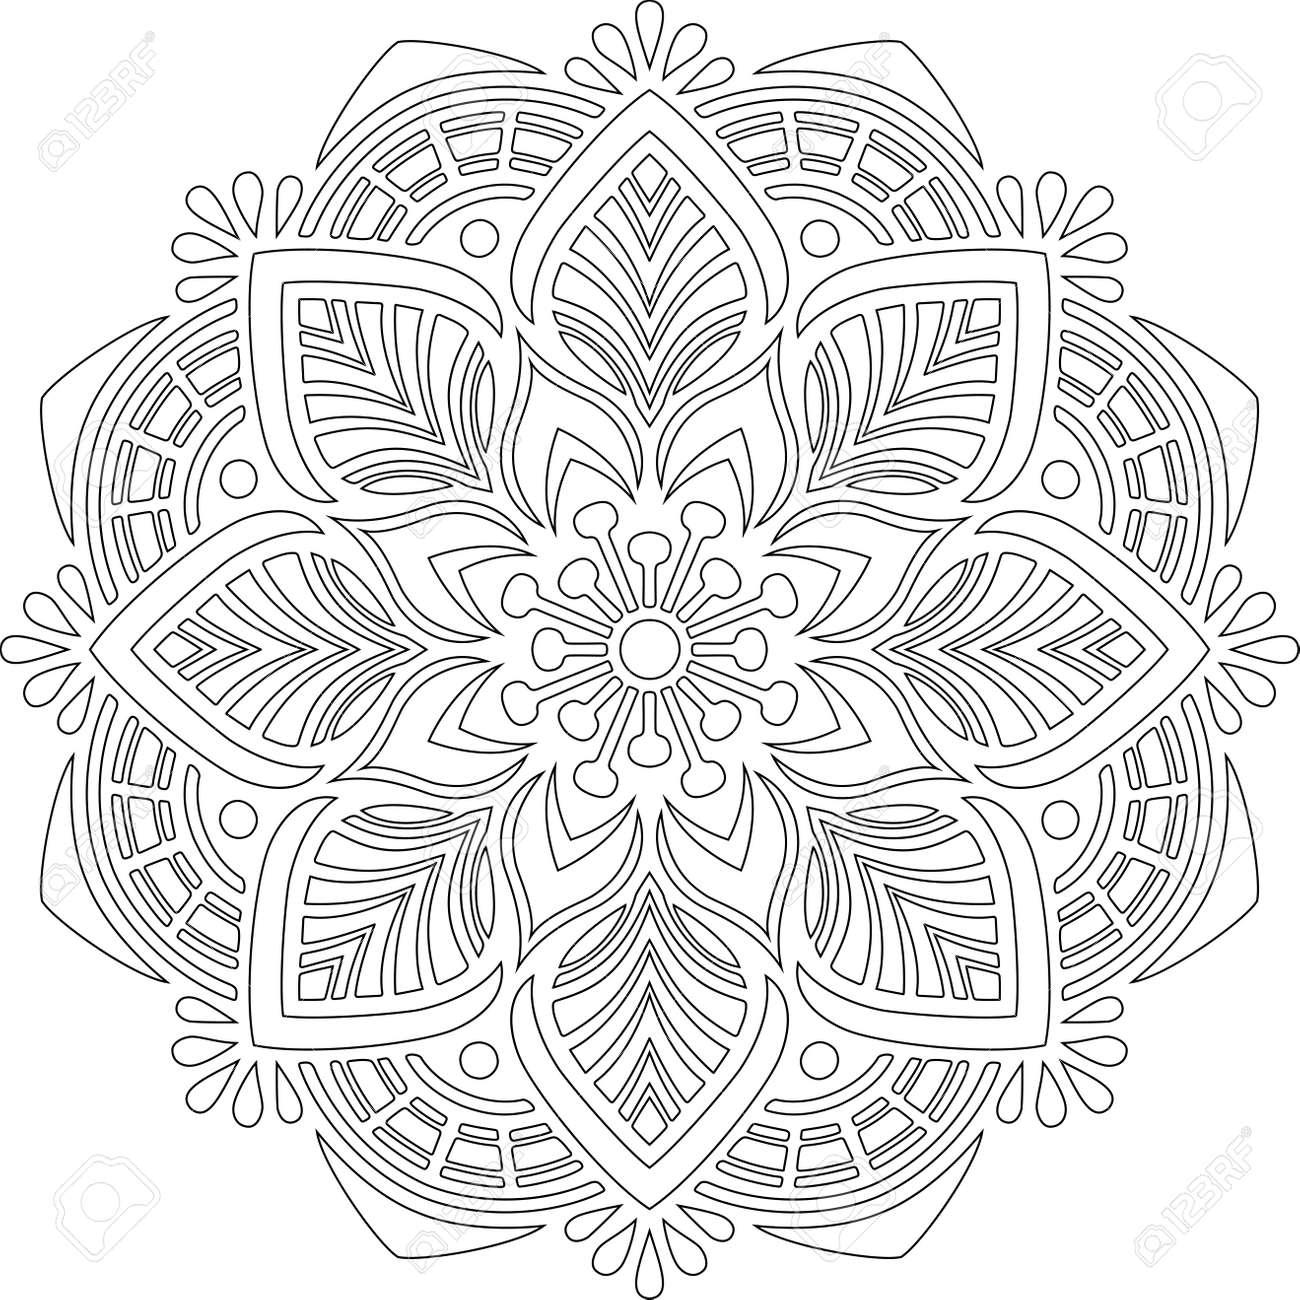 Figure mandala for coloring doodles sketch good mood - 167506518